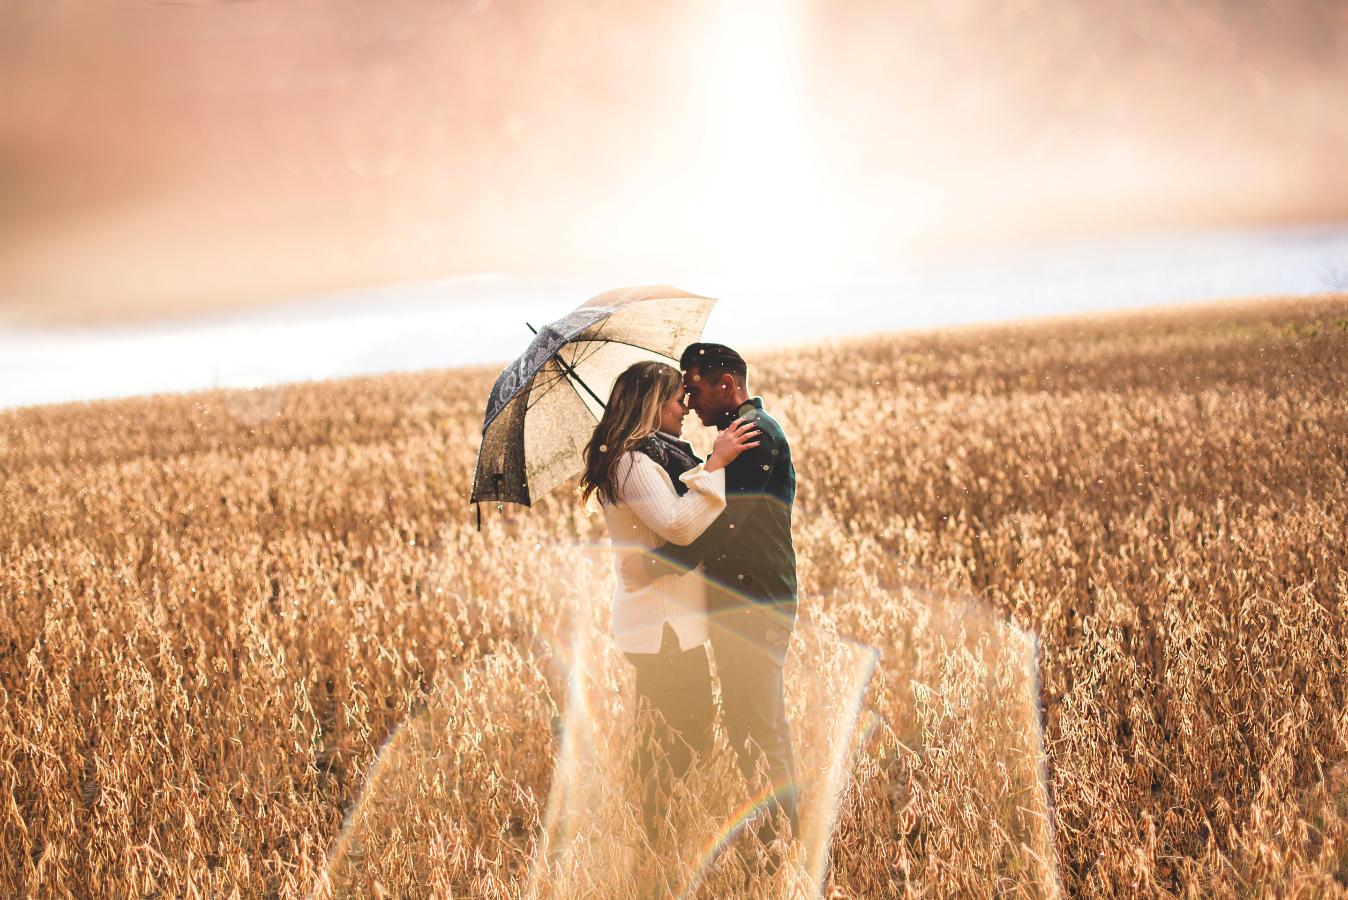 Engagement-Photography-Bruce-Trail-Rain-Hamilton-Burlington-Oakville-Niagara-Toronto-Wedding-Photographer-Photo-Image-7.png